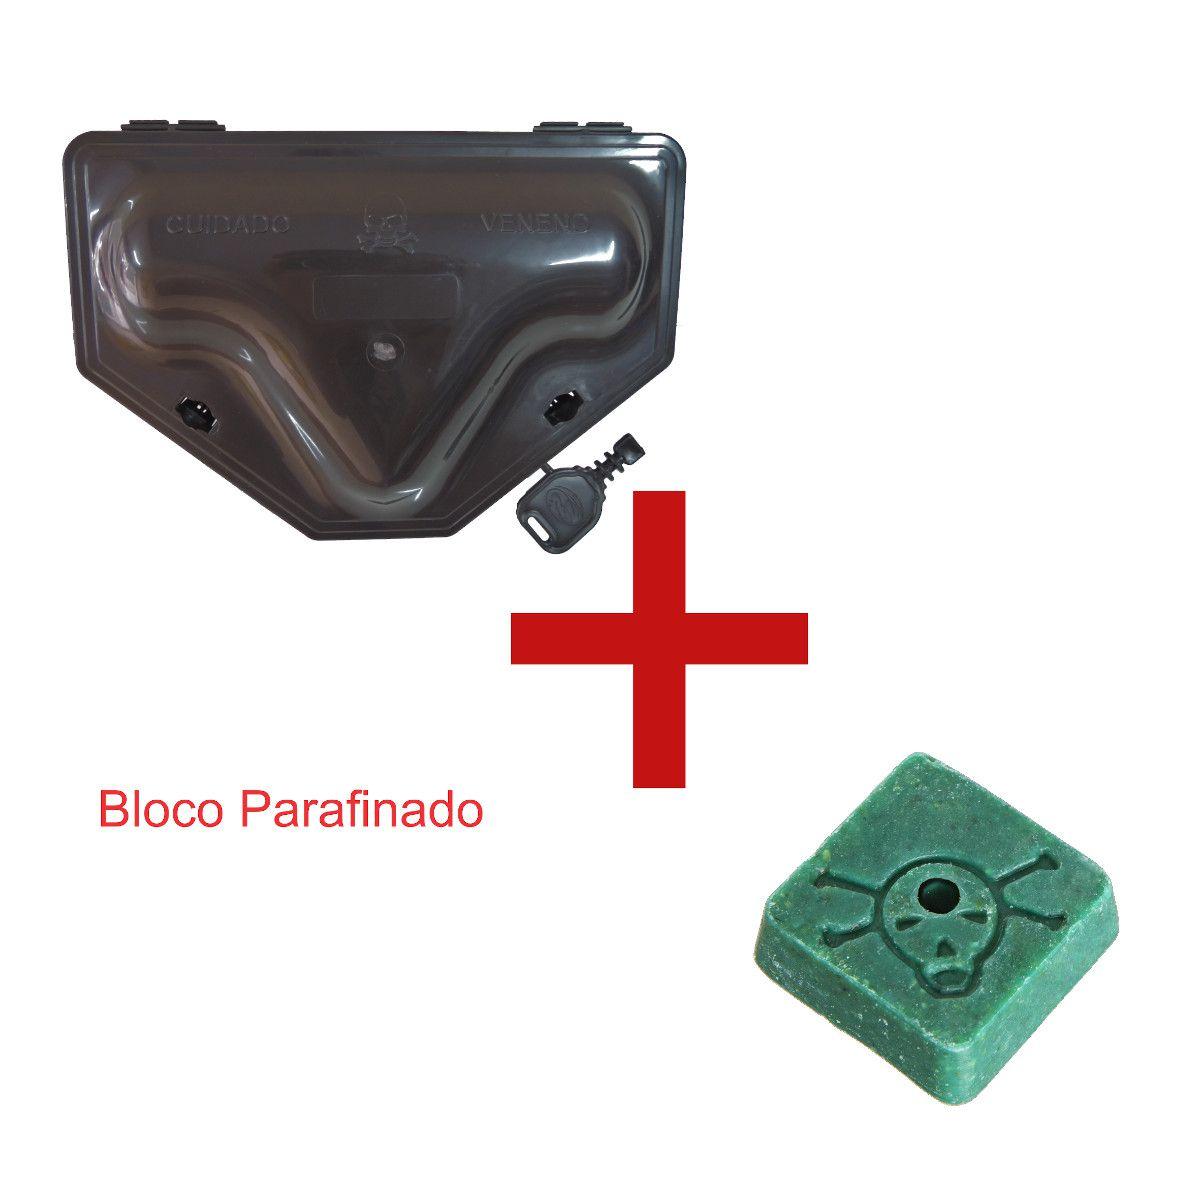 KIT 65 Porta Iscas Reforçado Ratoeira 2 TRAVAS Chave p/Ratos